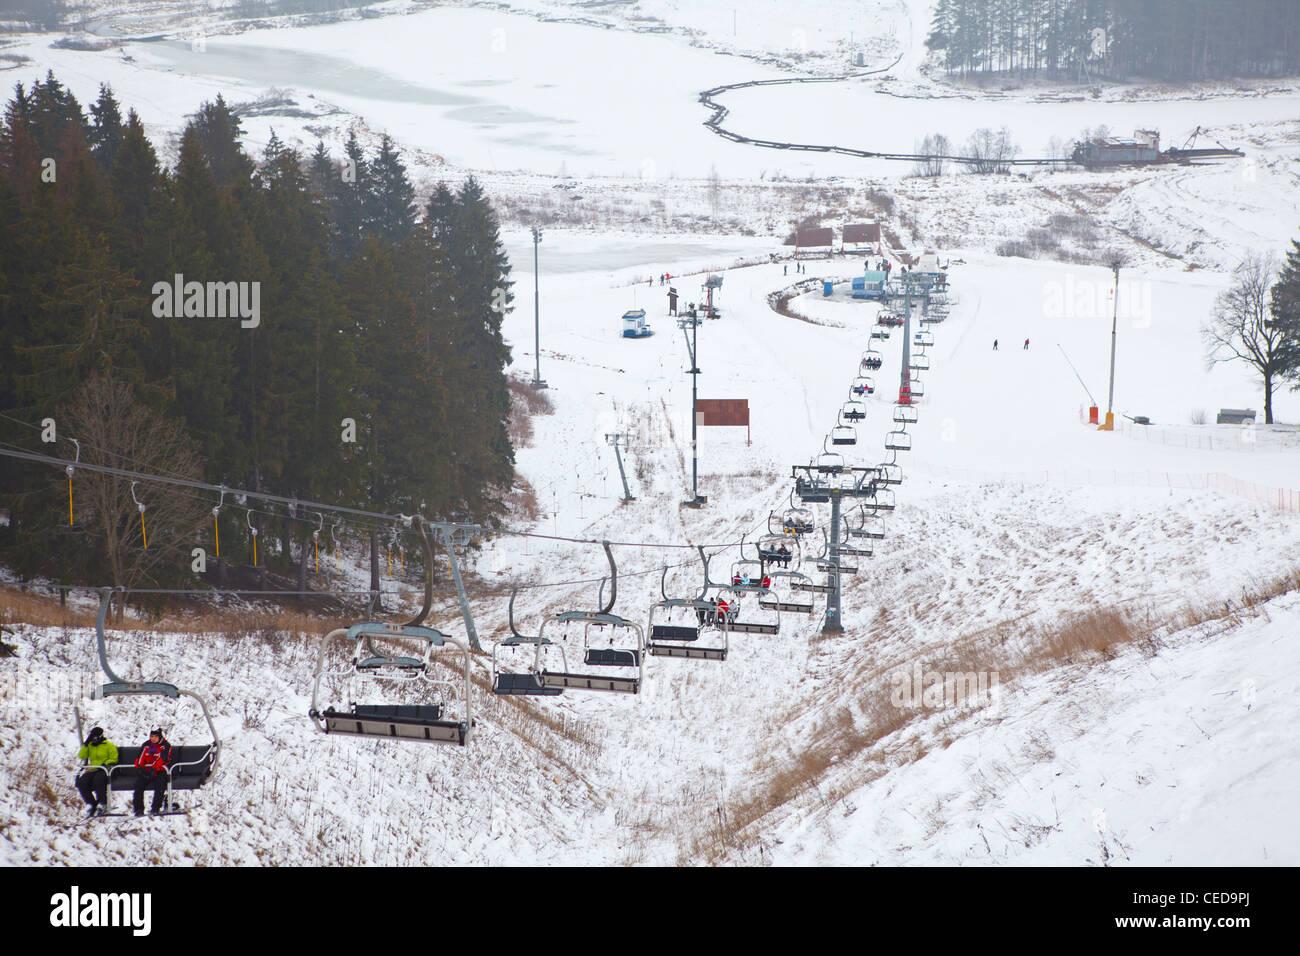 russian ski resorts sorochany in winter season with resting people